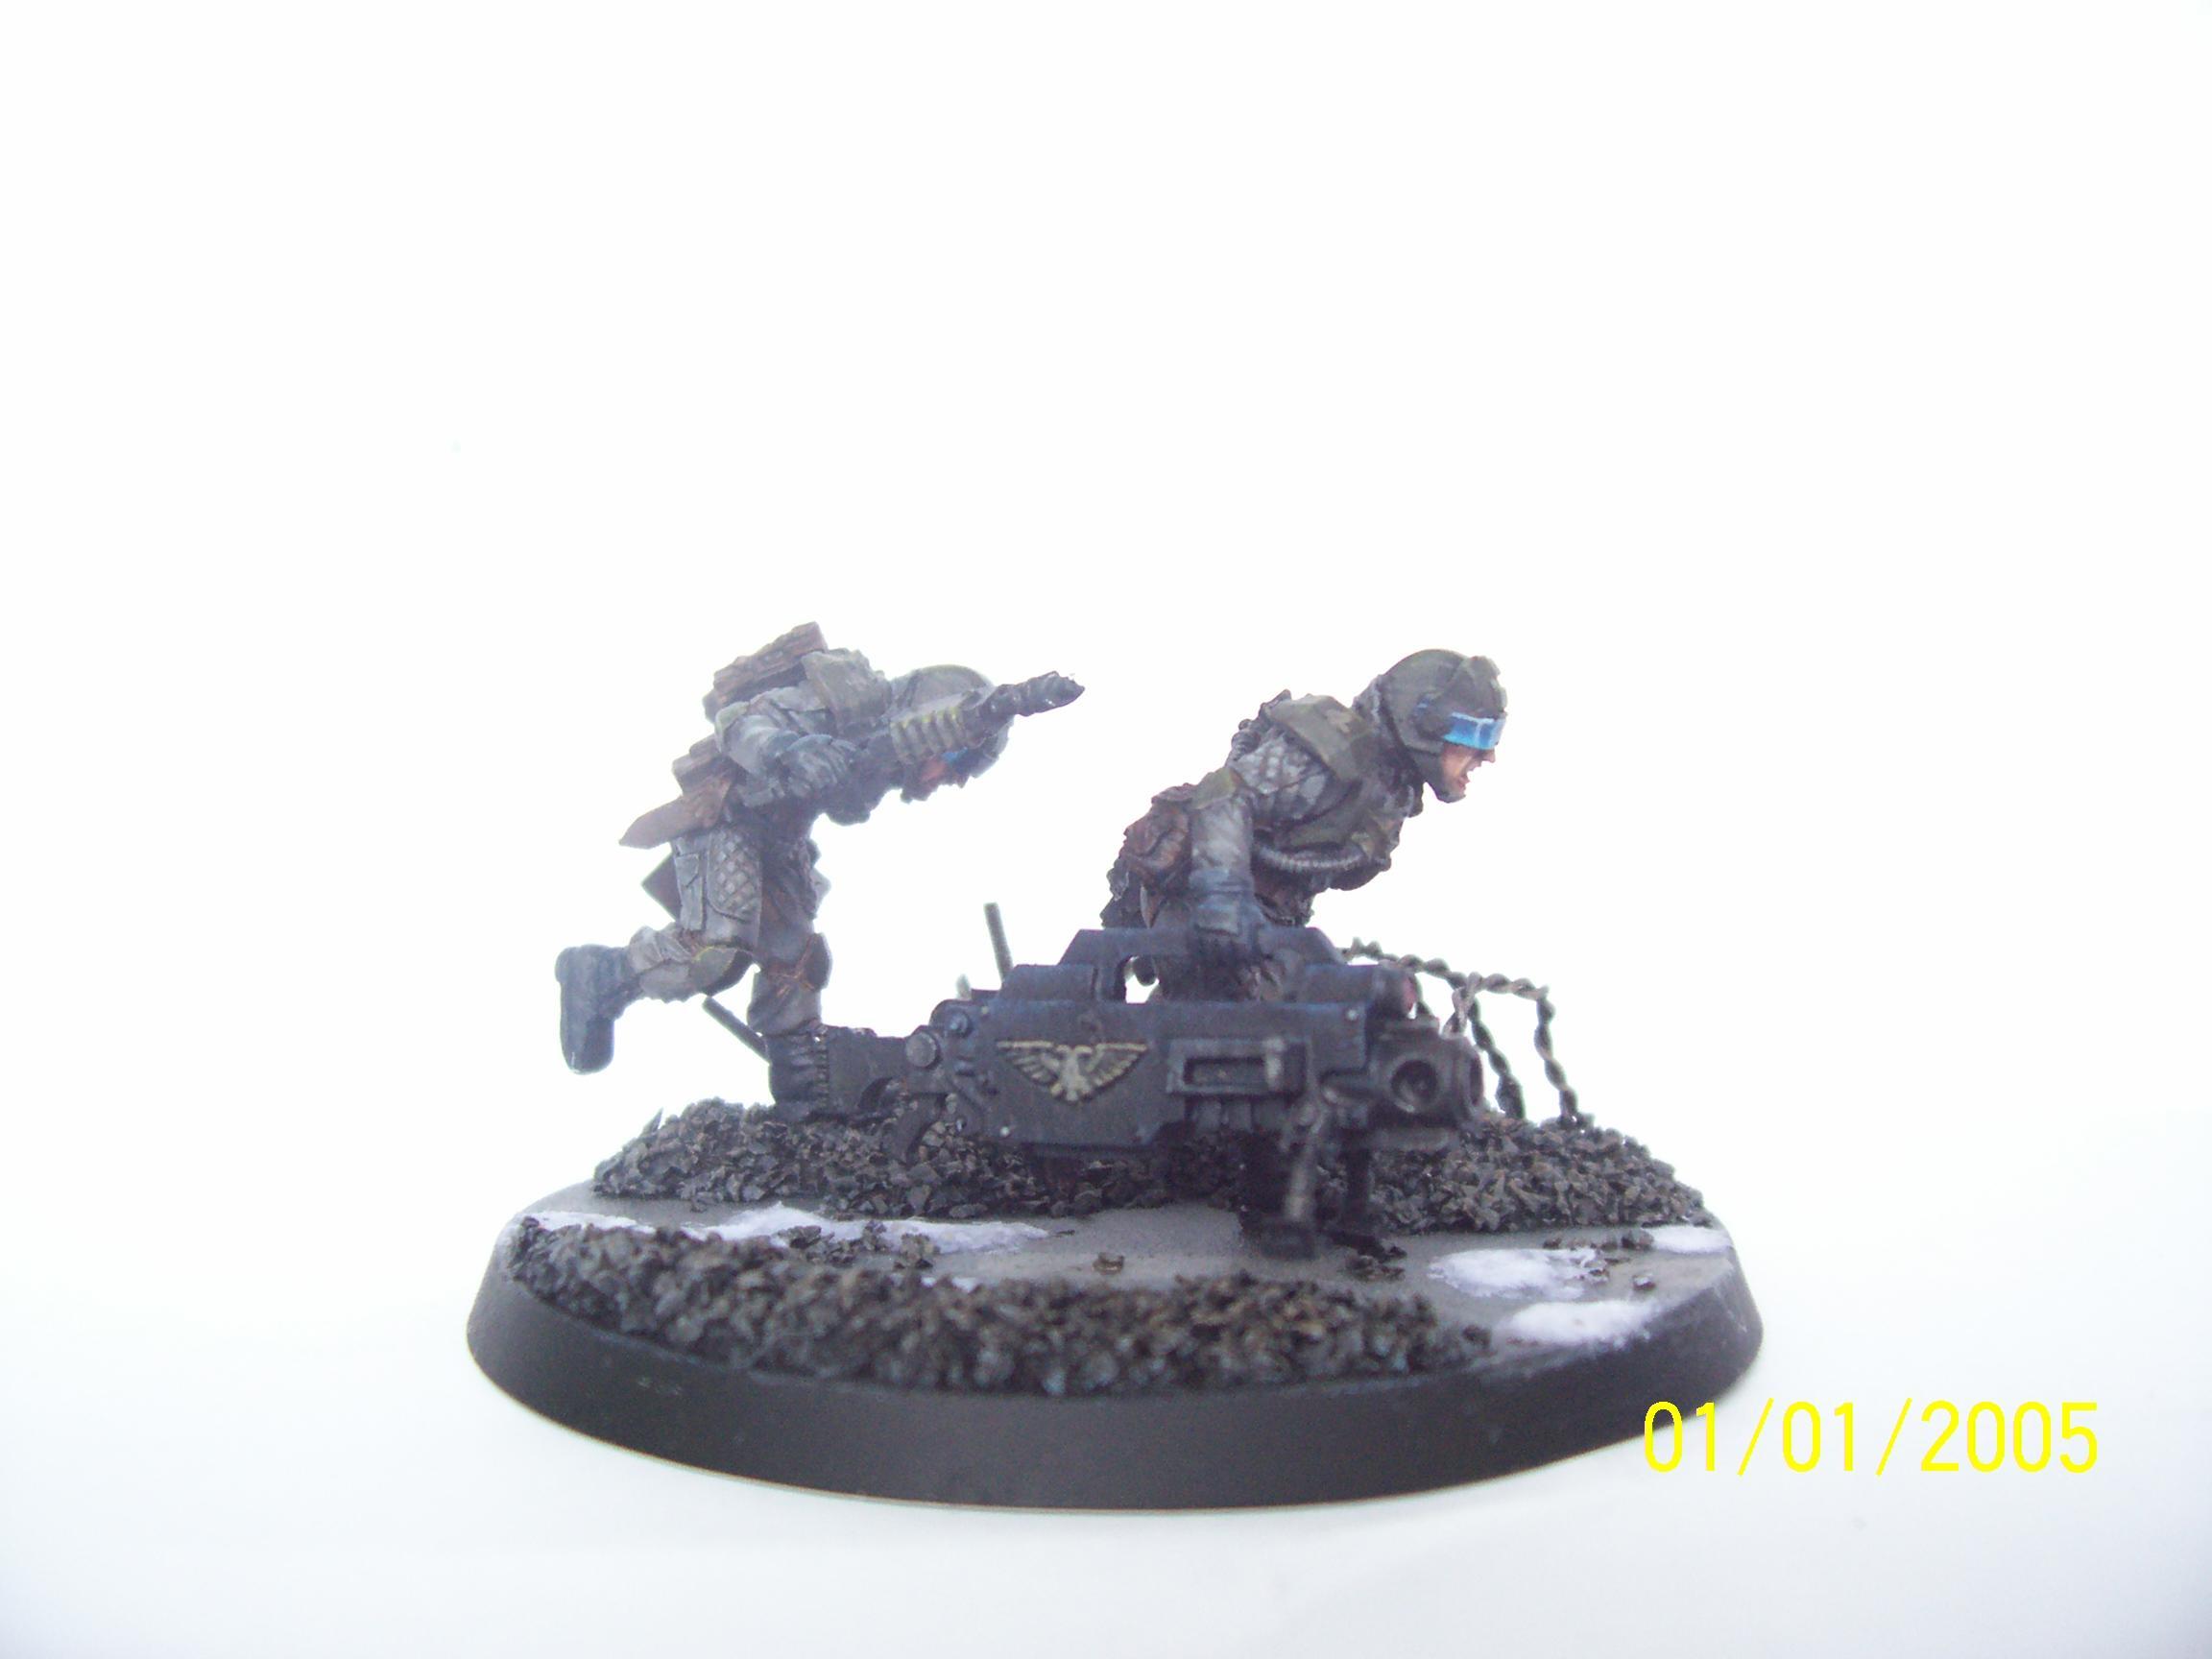 Elysian, Elysian Drop Troops, Elysians, Guardsmen, Heavy Bolter, Lasgun, Warhammer 40,000